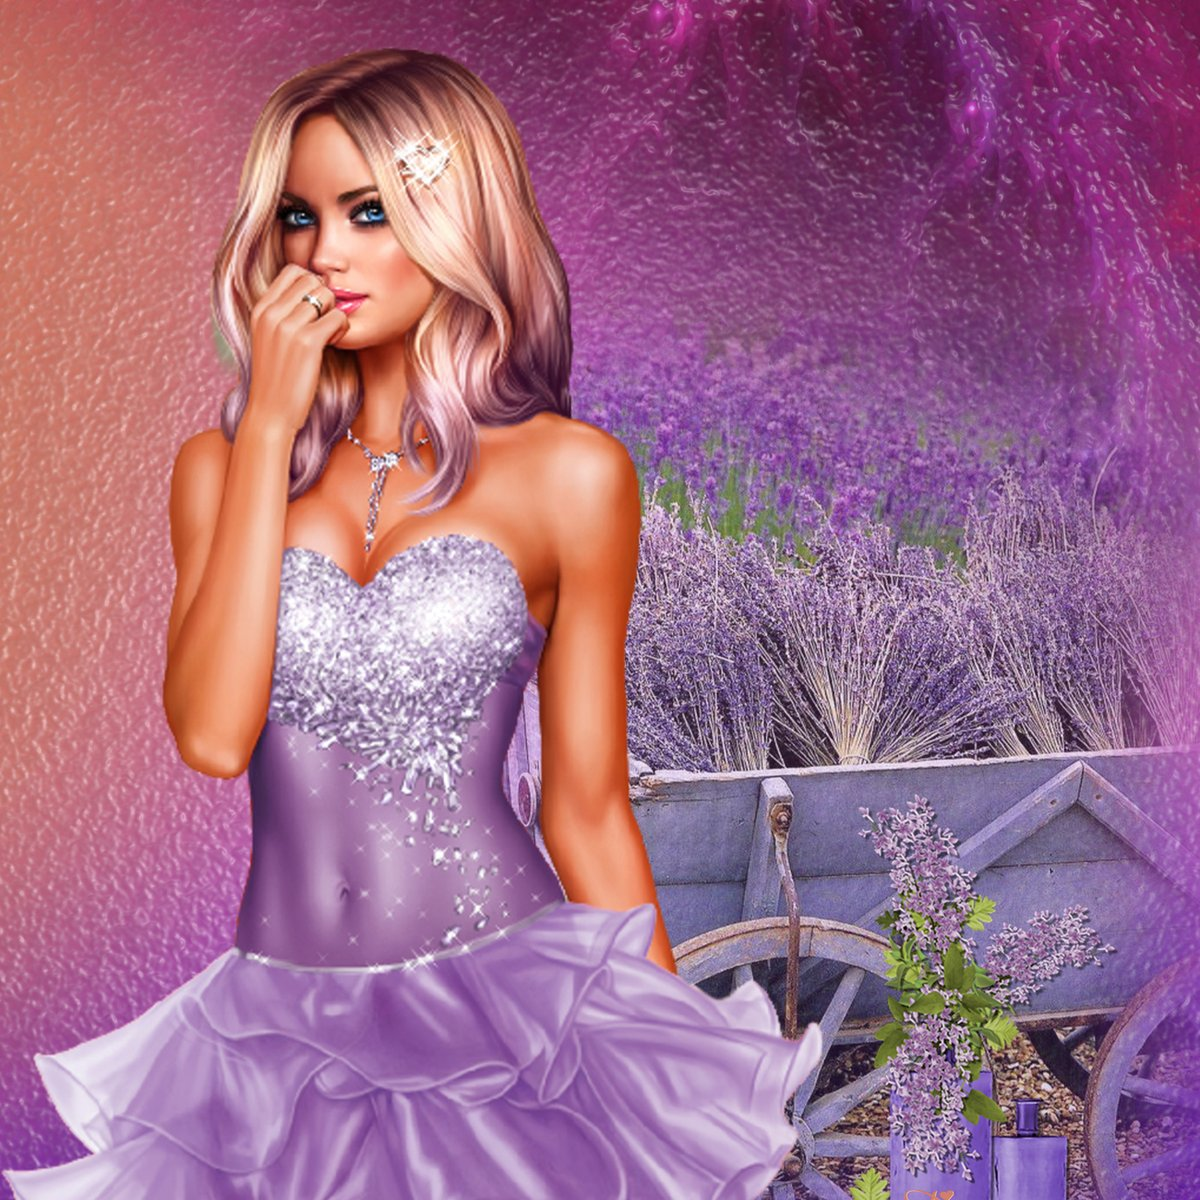 Lavender-garden by Freethinker56 | Celebrate #3dart fashion at